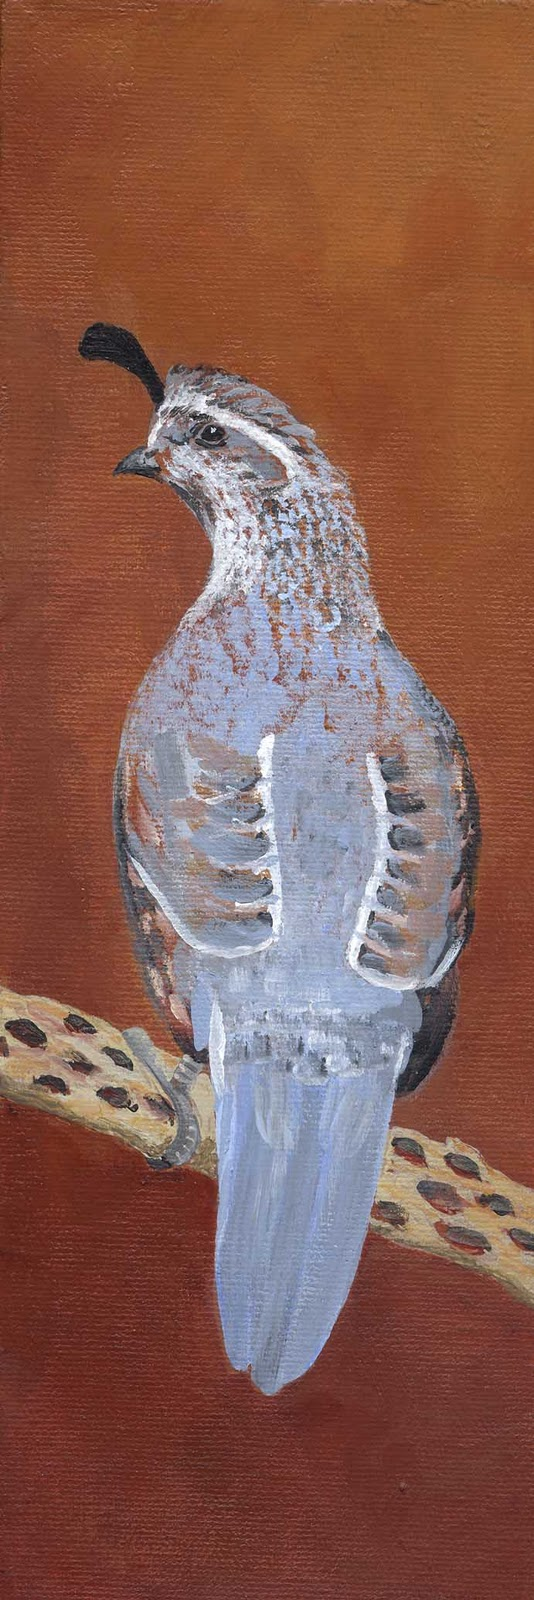 """Gamble Quail Female"" original fine art by Michelle Wolfe"